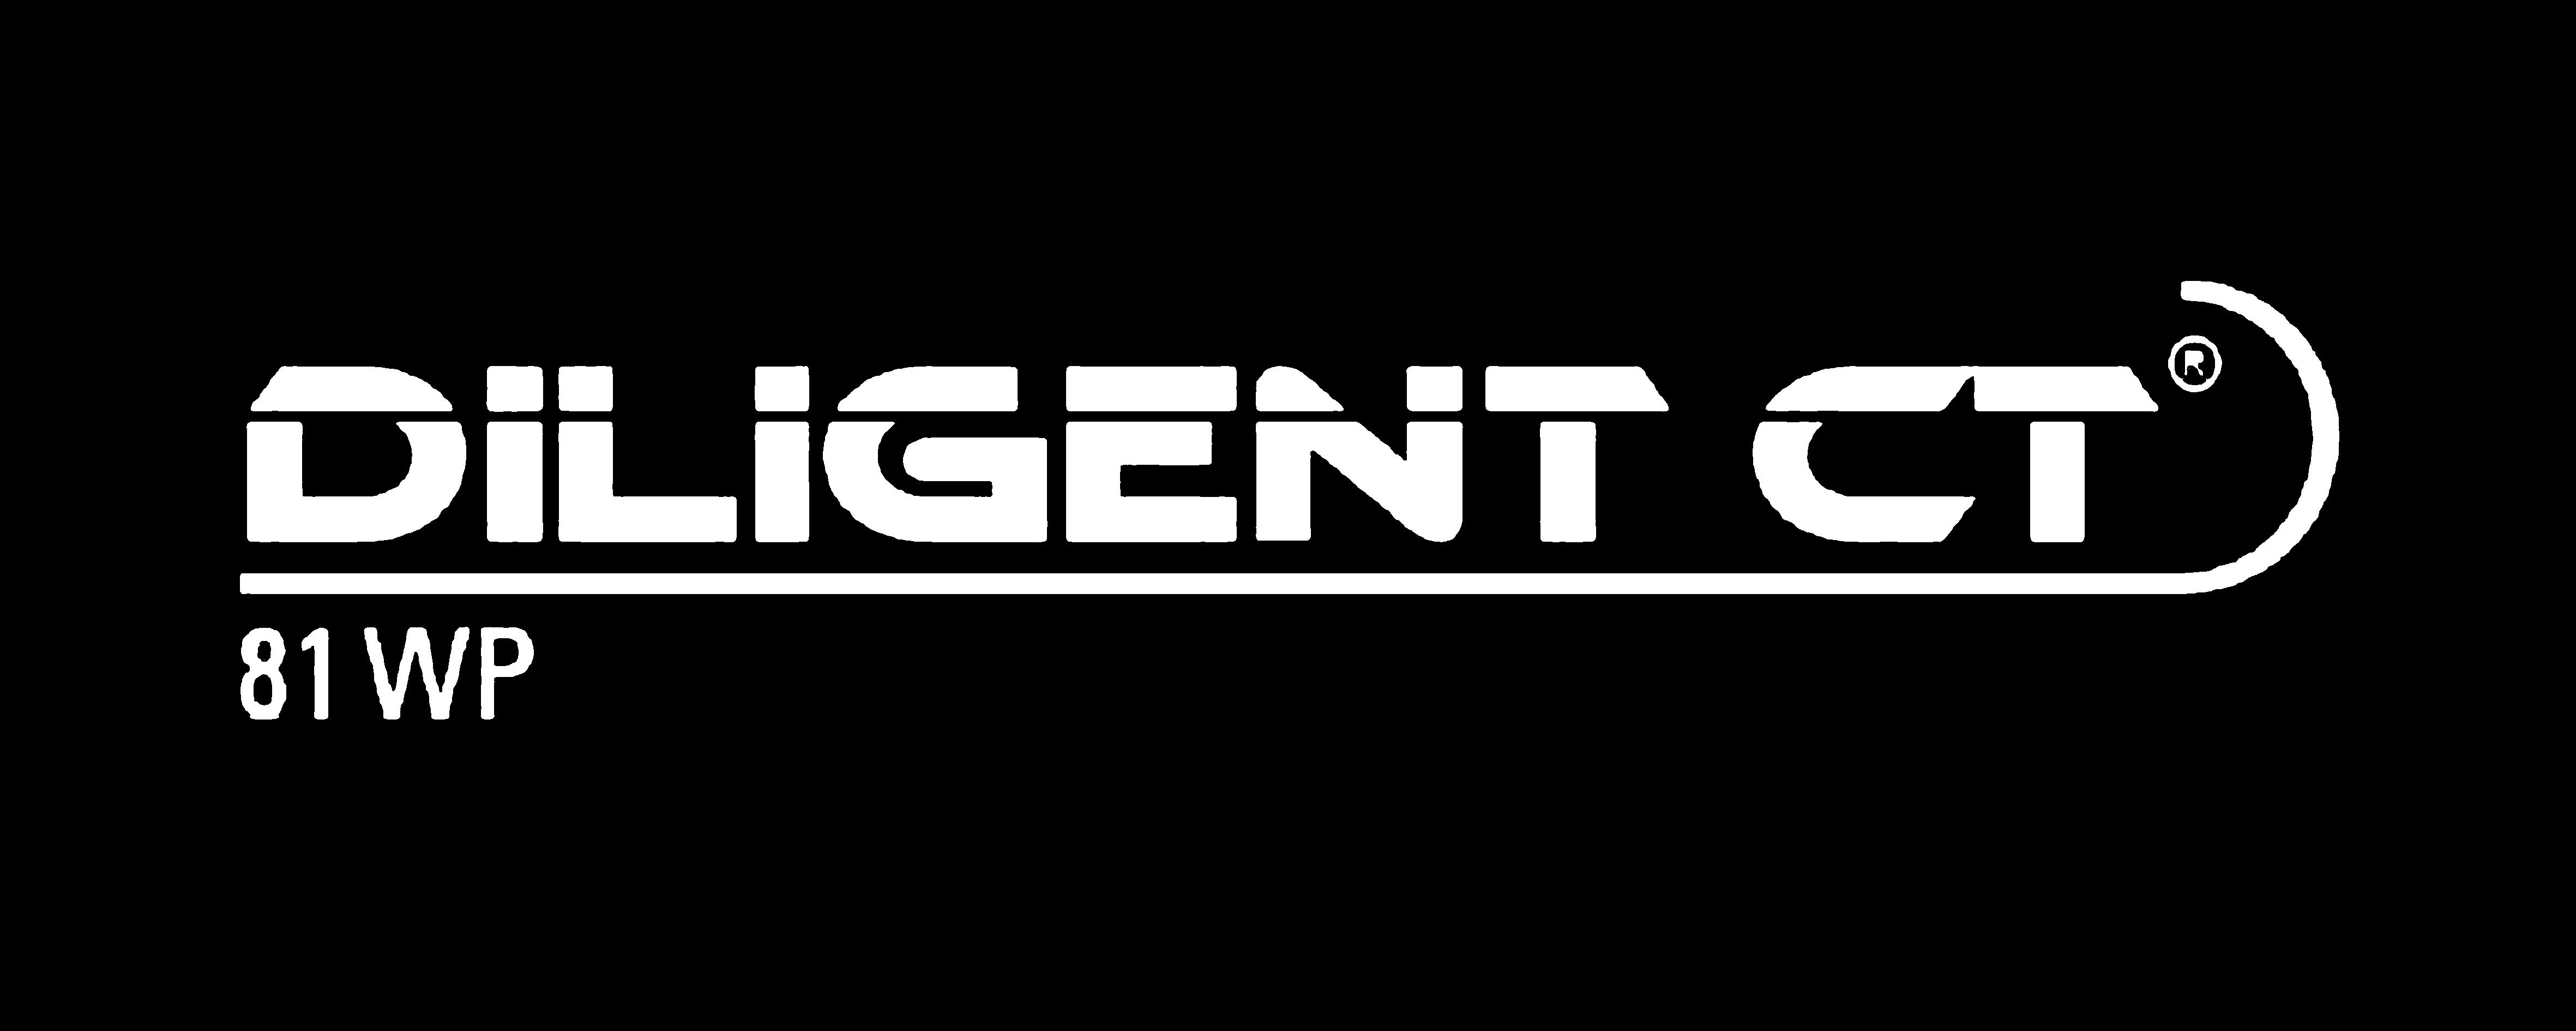 DILIGENT-CT-81-WP